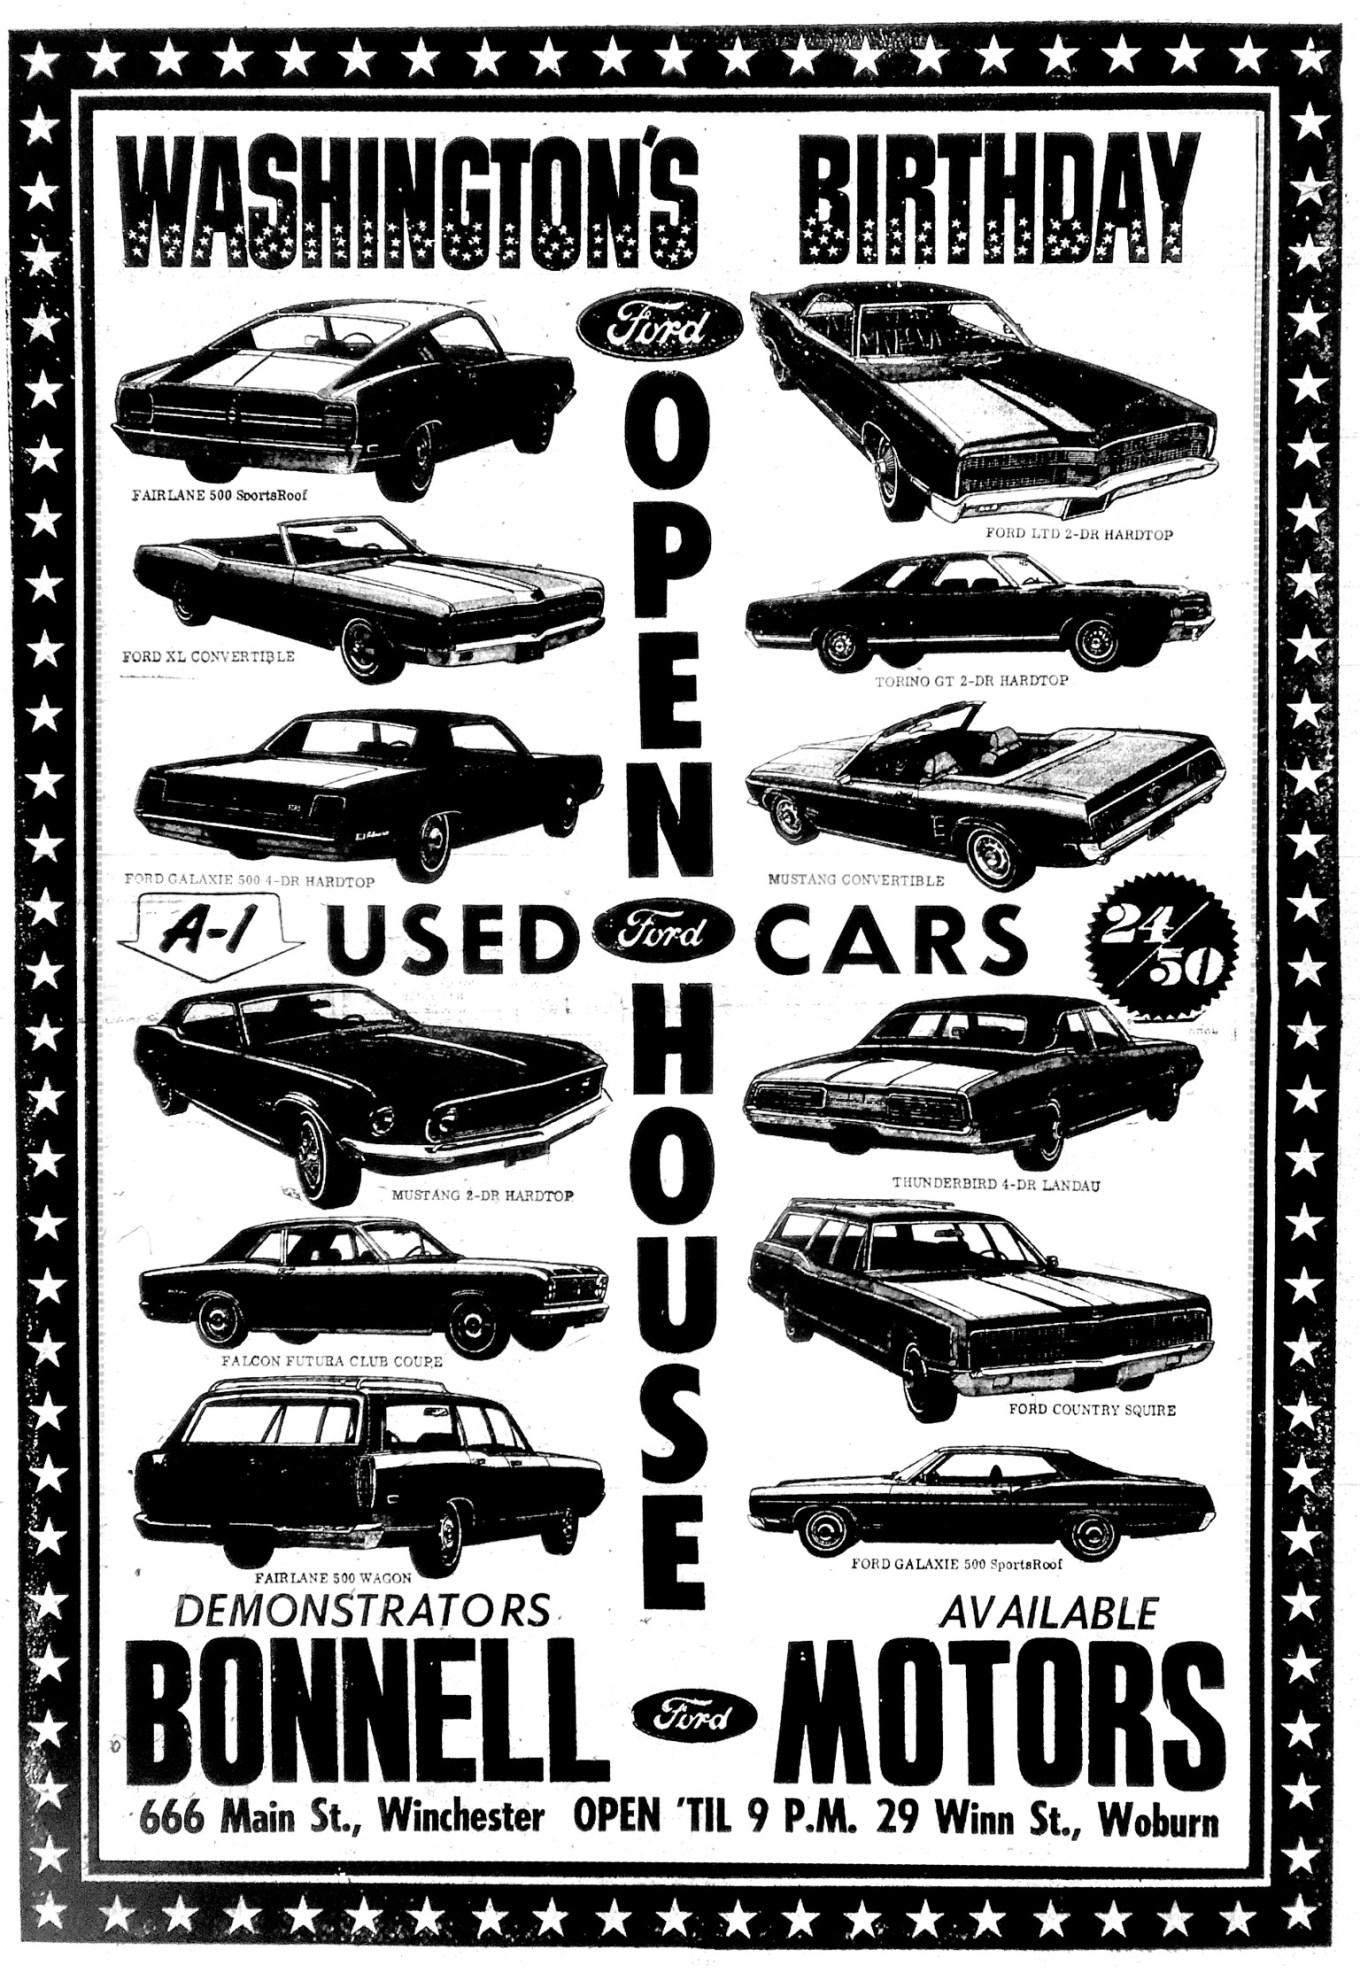 Bonnell Motors ad